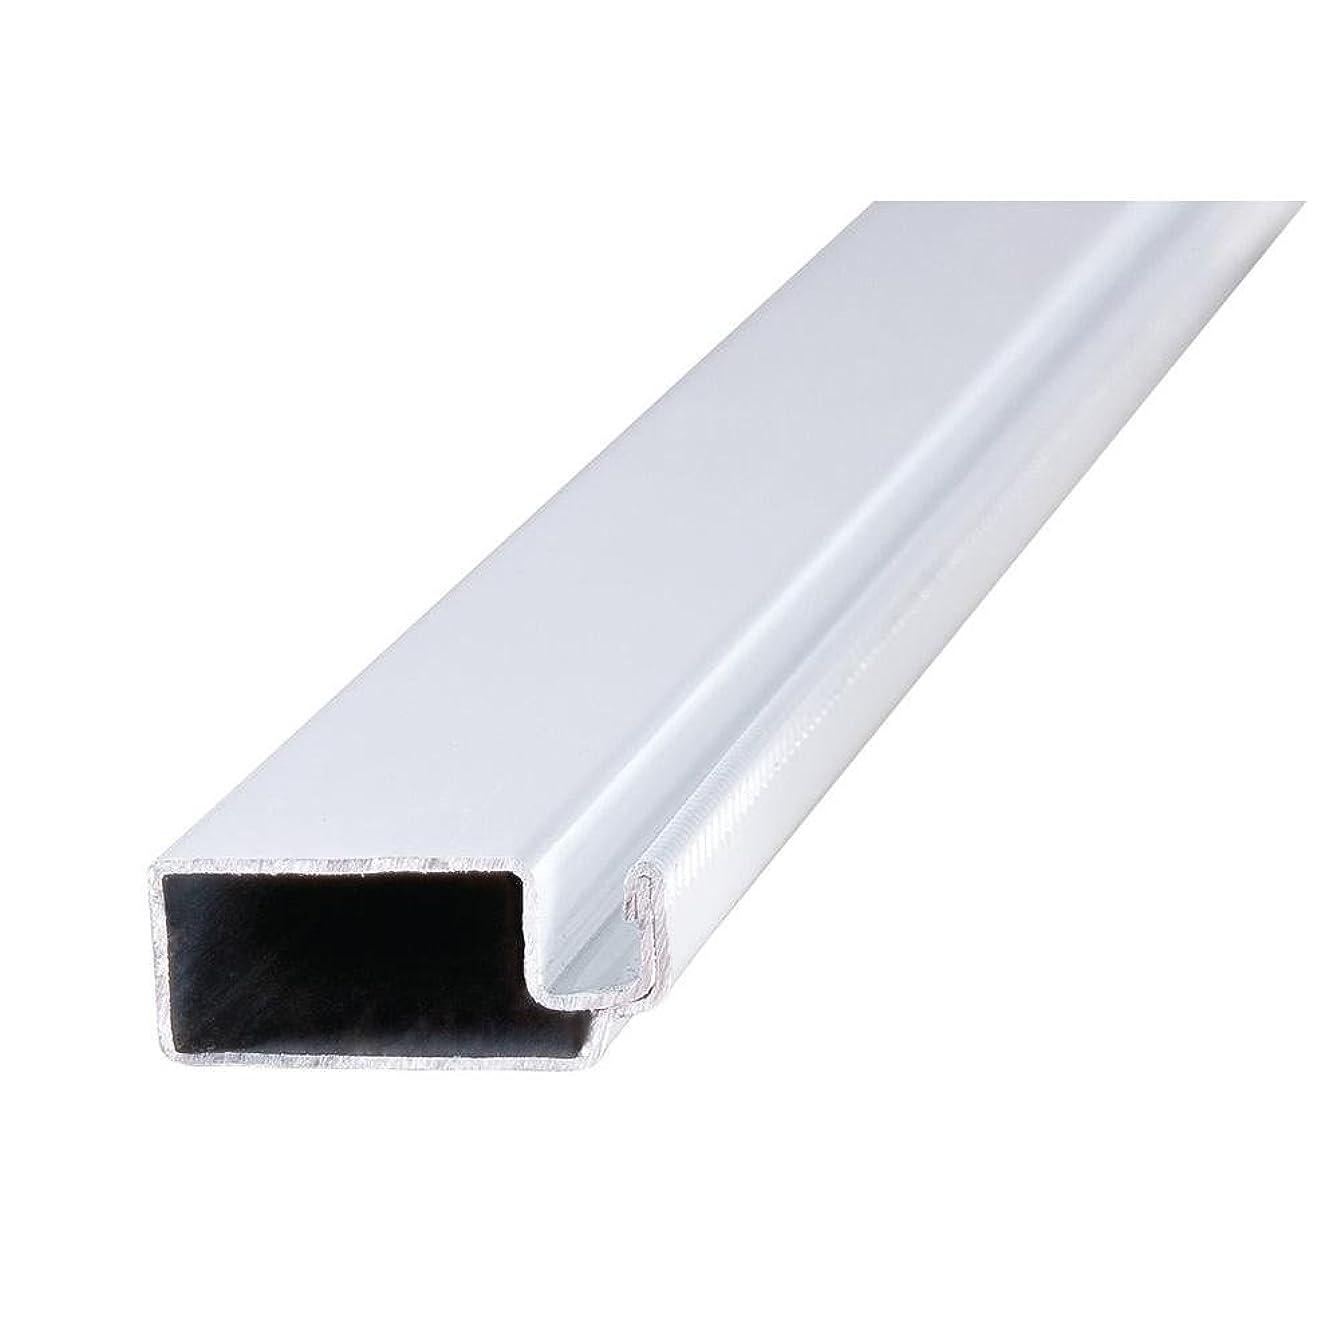 4 Pack - Window Screen Kit w/Aluminum Frame, Corners, Spline, Springs, Pull Tabs, and Screen Mesh (White)